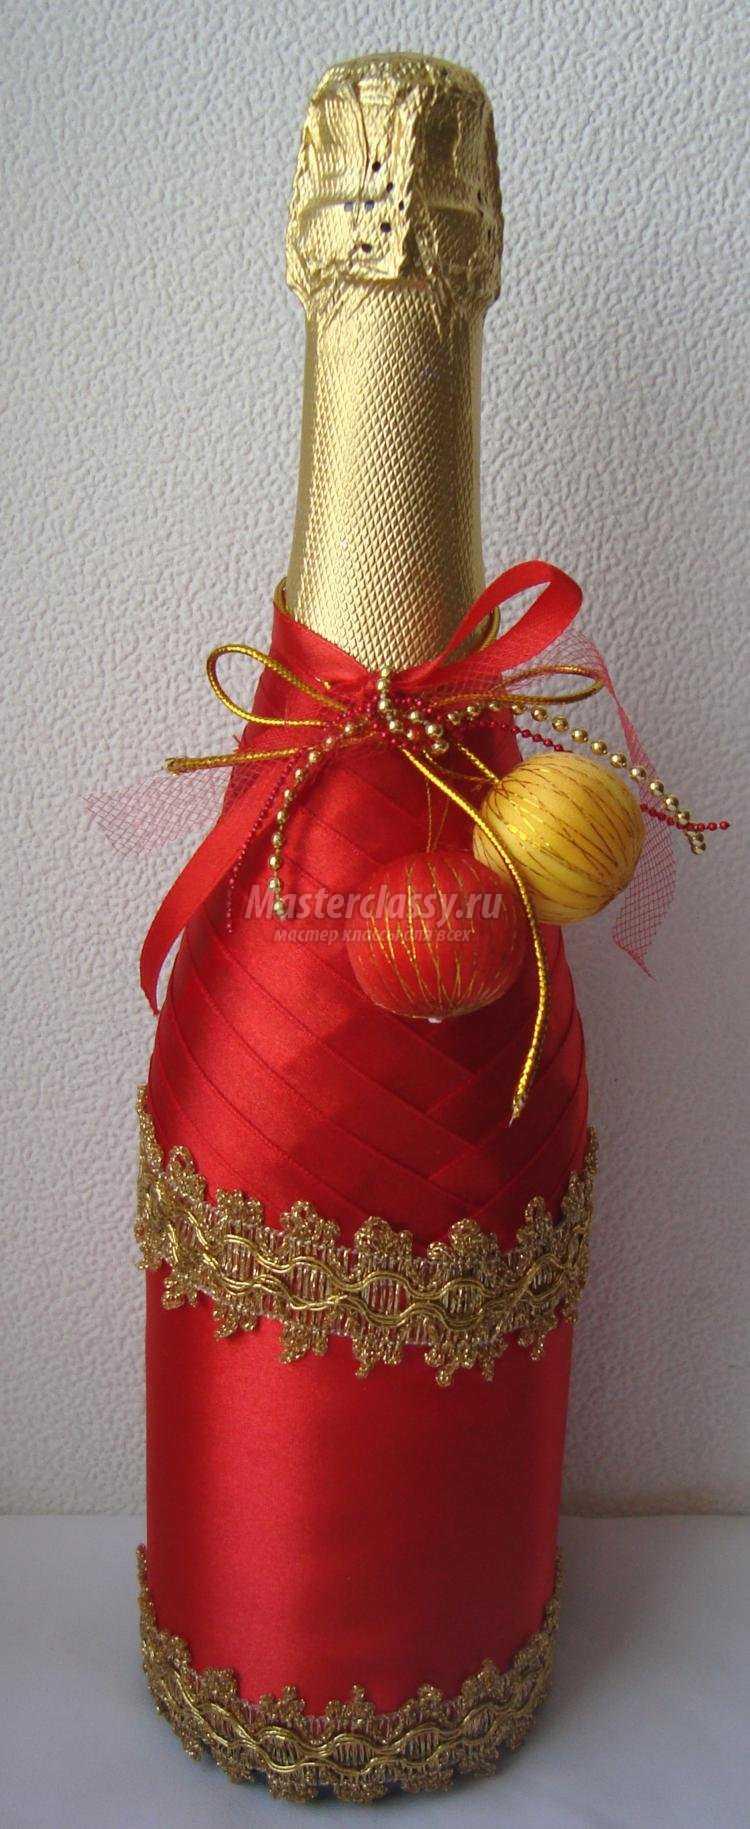 Декор шампанского атласными лентами своими руками фото 438